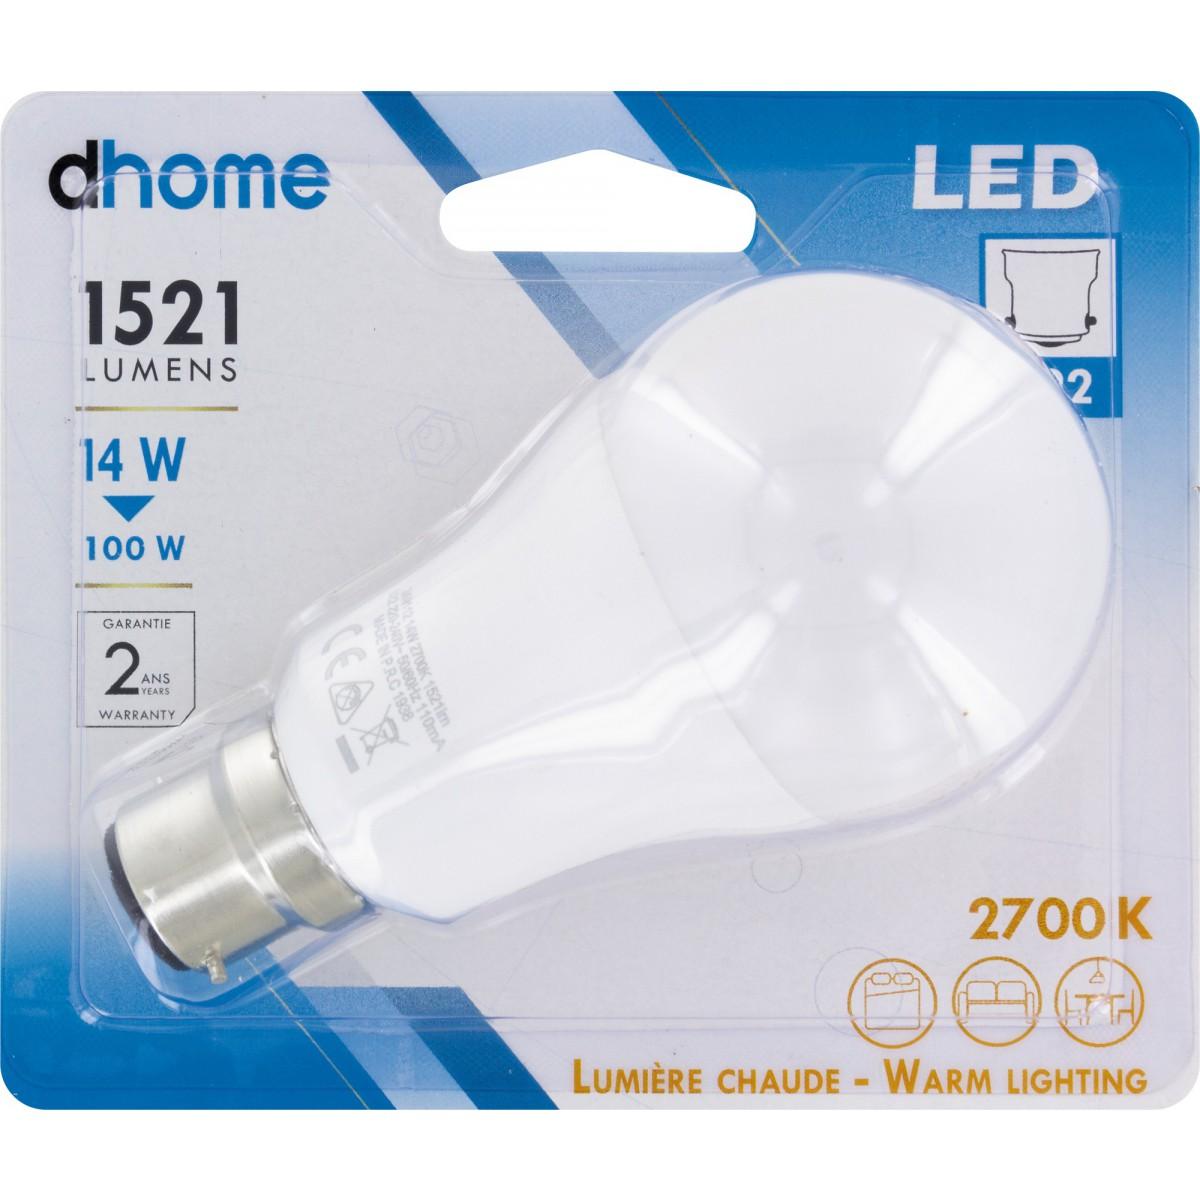 Ampoule LED standard B22 dhome - 1521 Lumens - 14 W - 2700 K